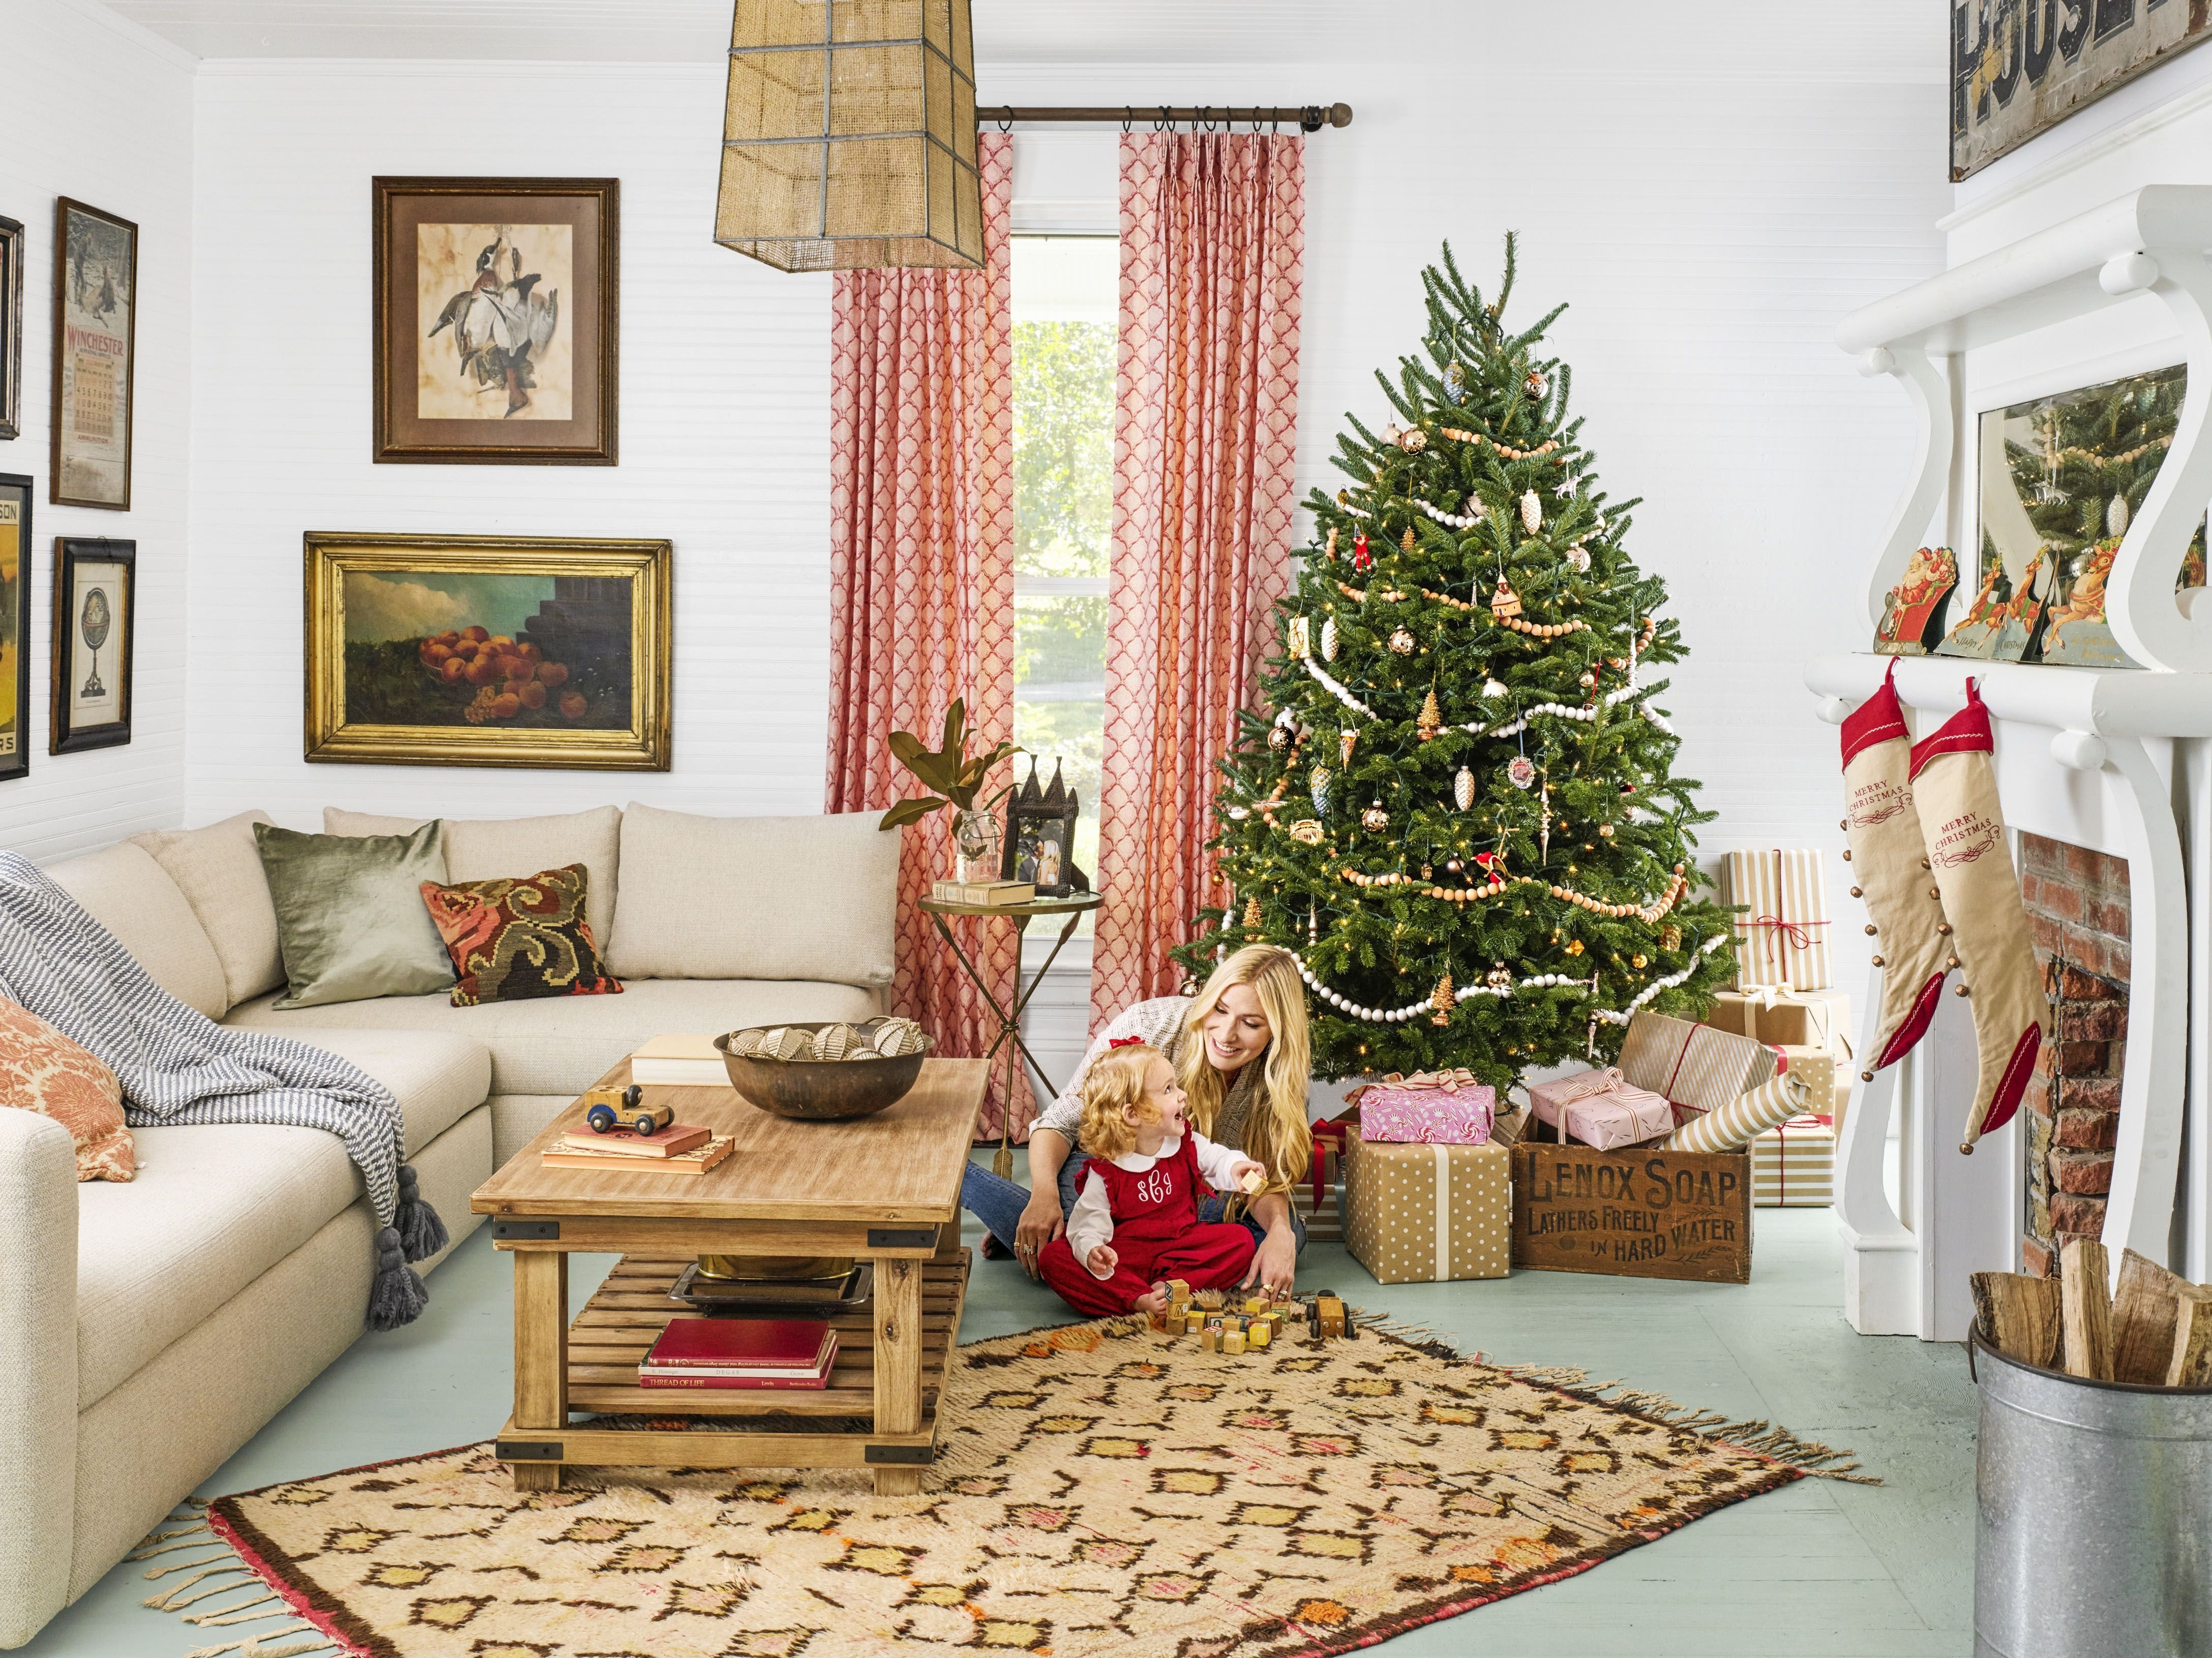 10 Pretty Christmas Decorations Ideas For Living Room living room living room christmas decoration ideas xmas decoration 2021